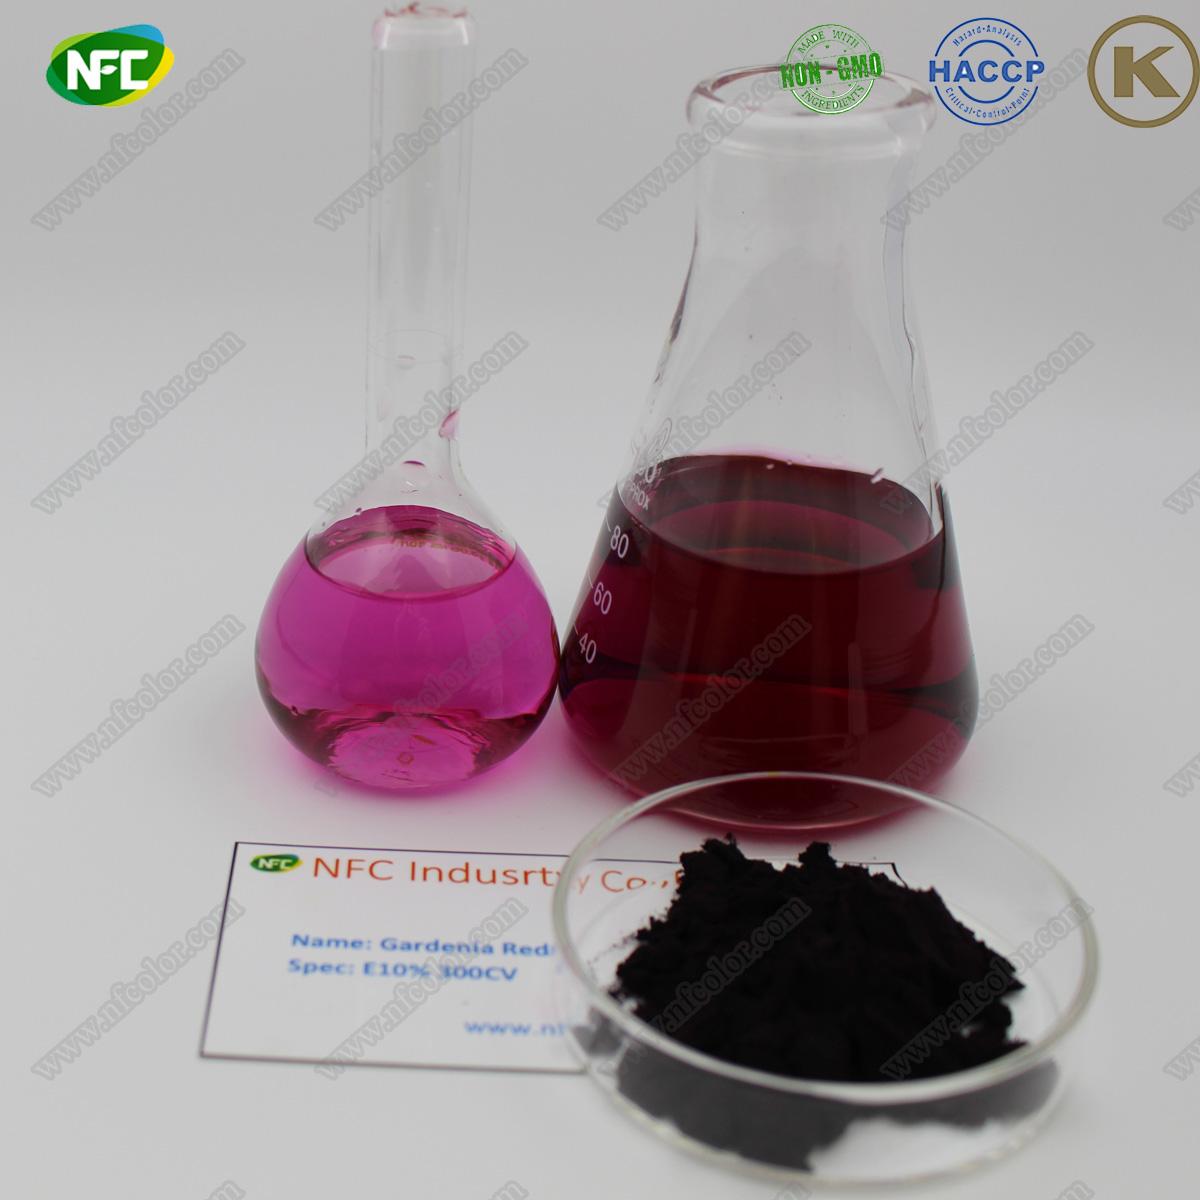 Gardenia Red,natural food coloring,certified organic colors,natural ...